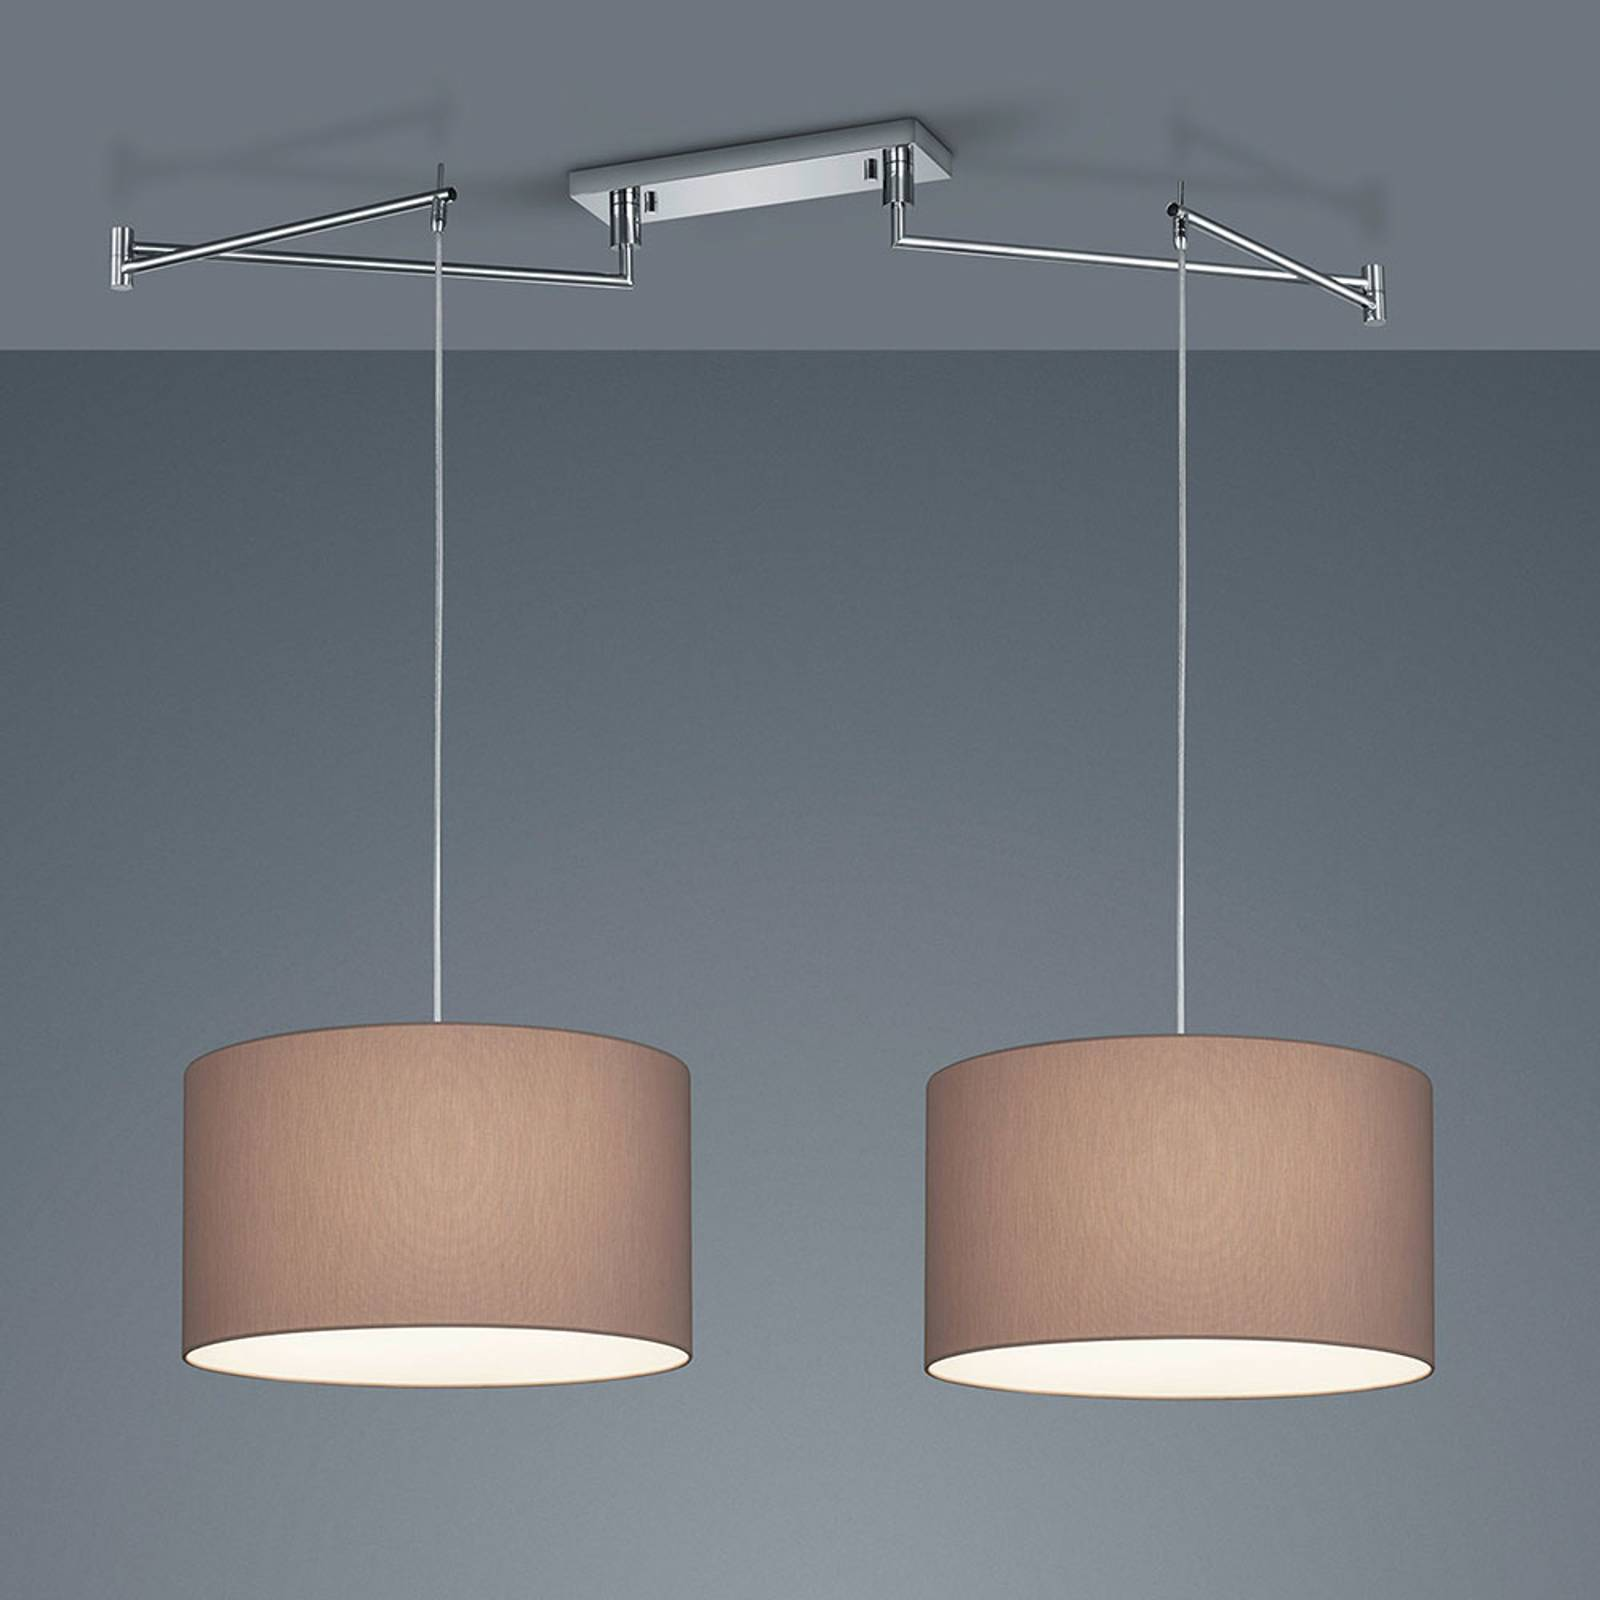 Helestra Certo hanglamp cilinder 2-lamps mocca